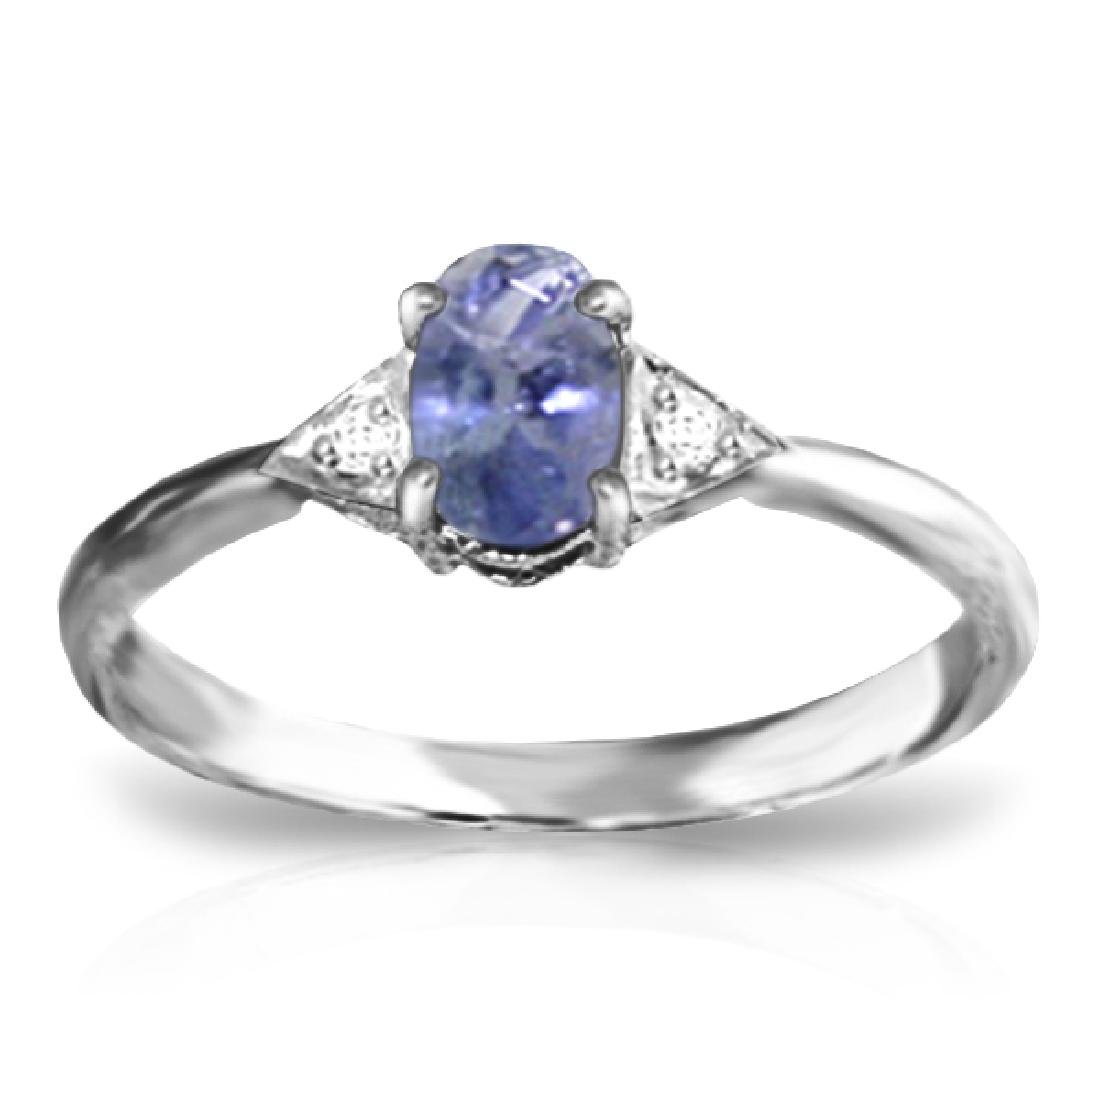 Genuine 0.41 ctw Tanzanite & Diamond Ring Jewelry 14KT